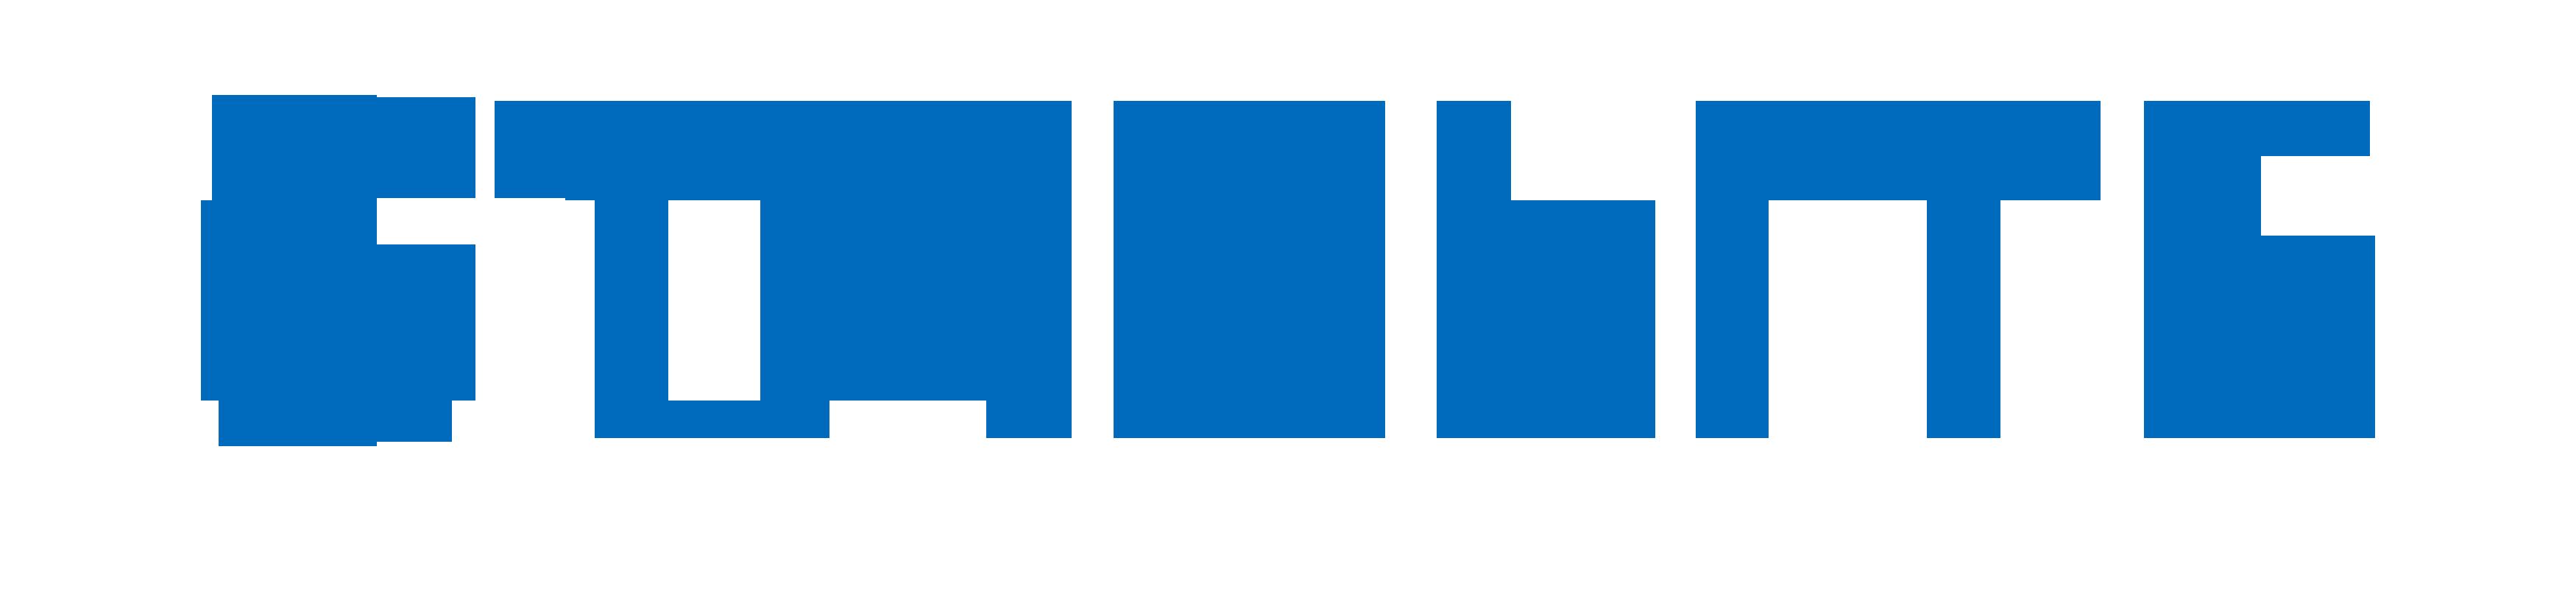 STARLITE(B)